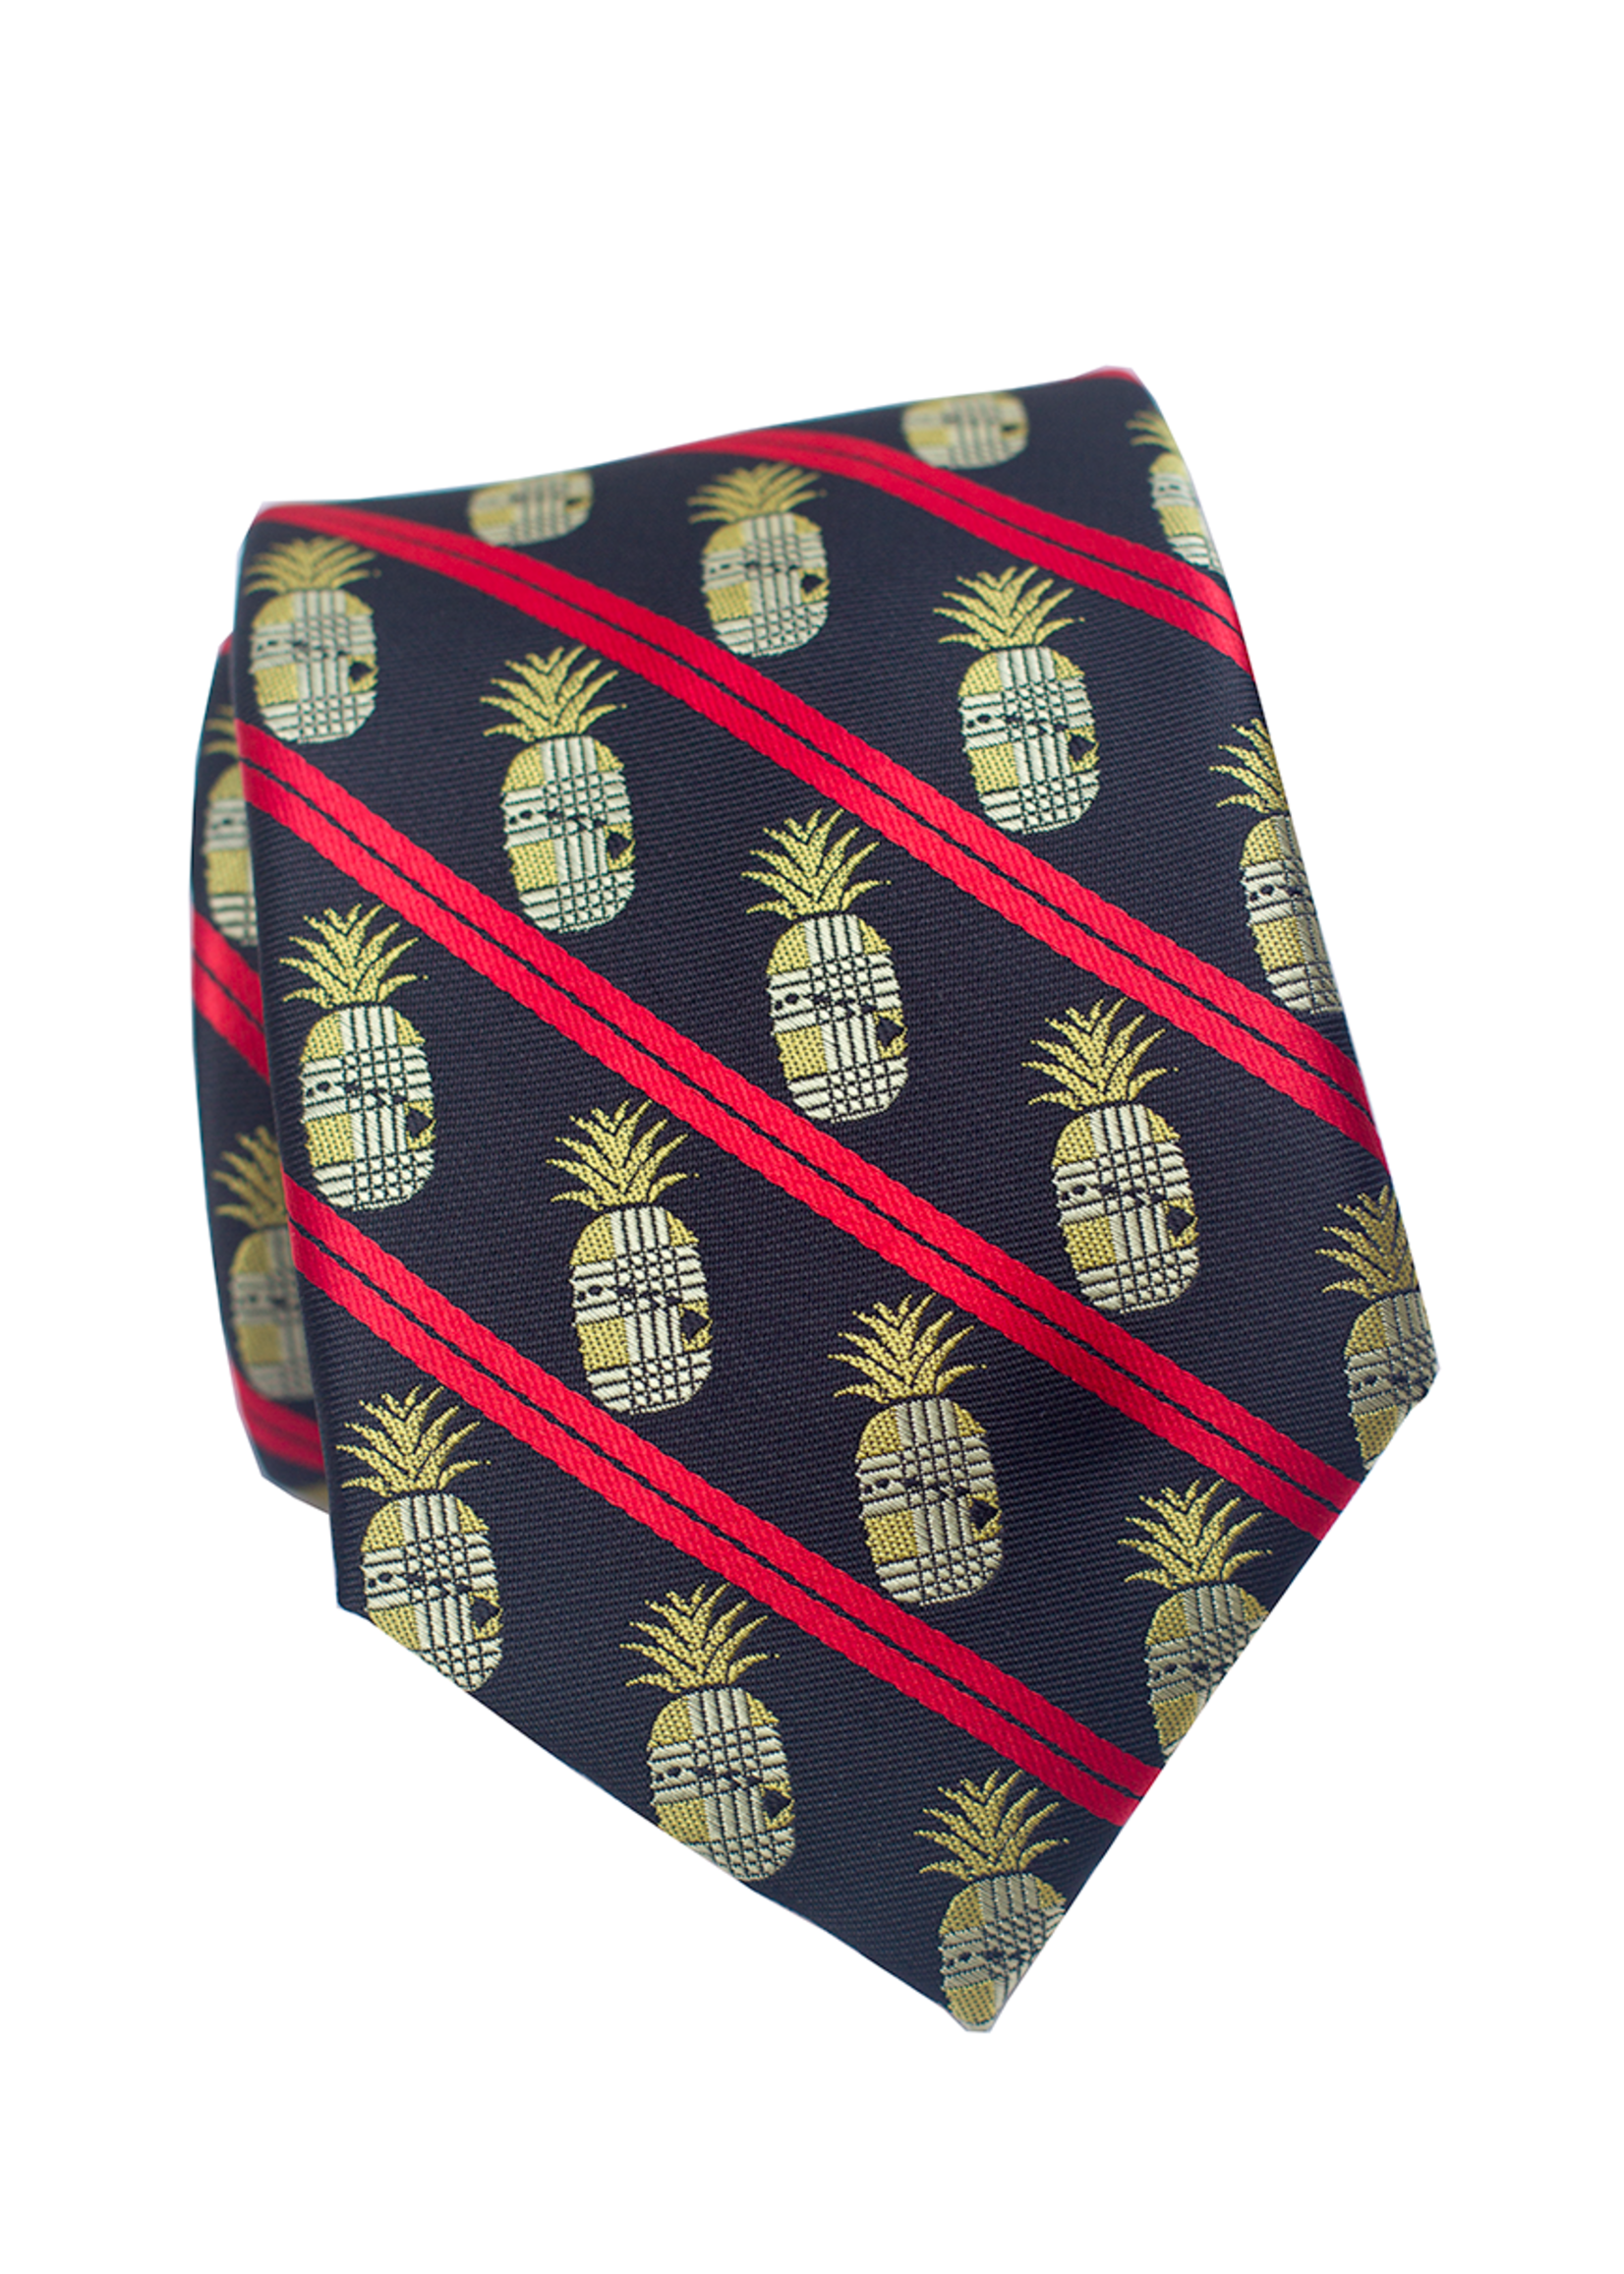 Pineapple Palaka Pineapple Palaka Ties -  DISC Hawaiian Pineapple EXECUTIVE Necktie